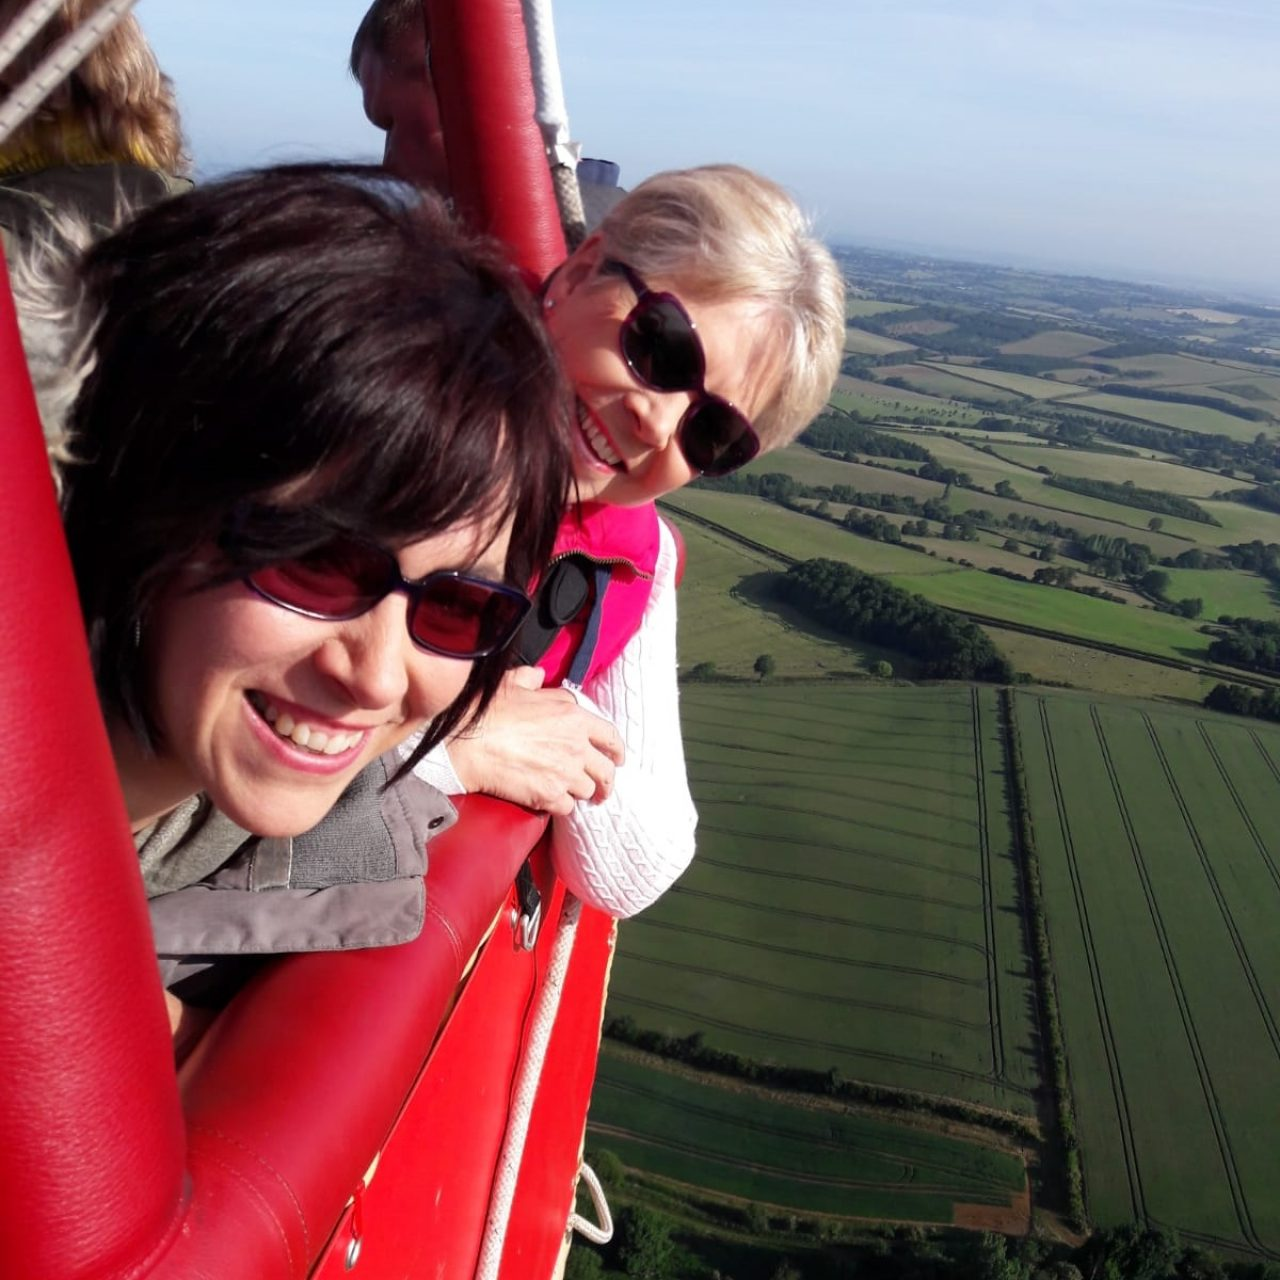 People loving their hot air balloon ride